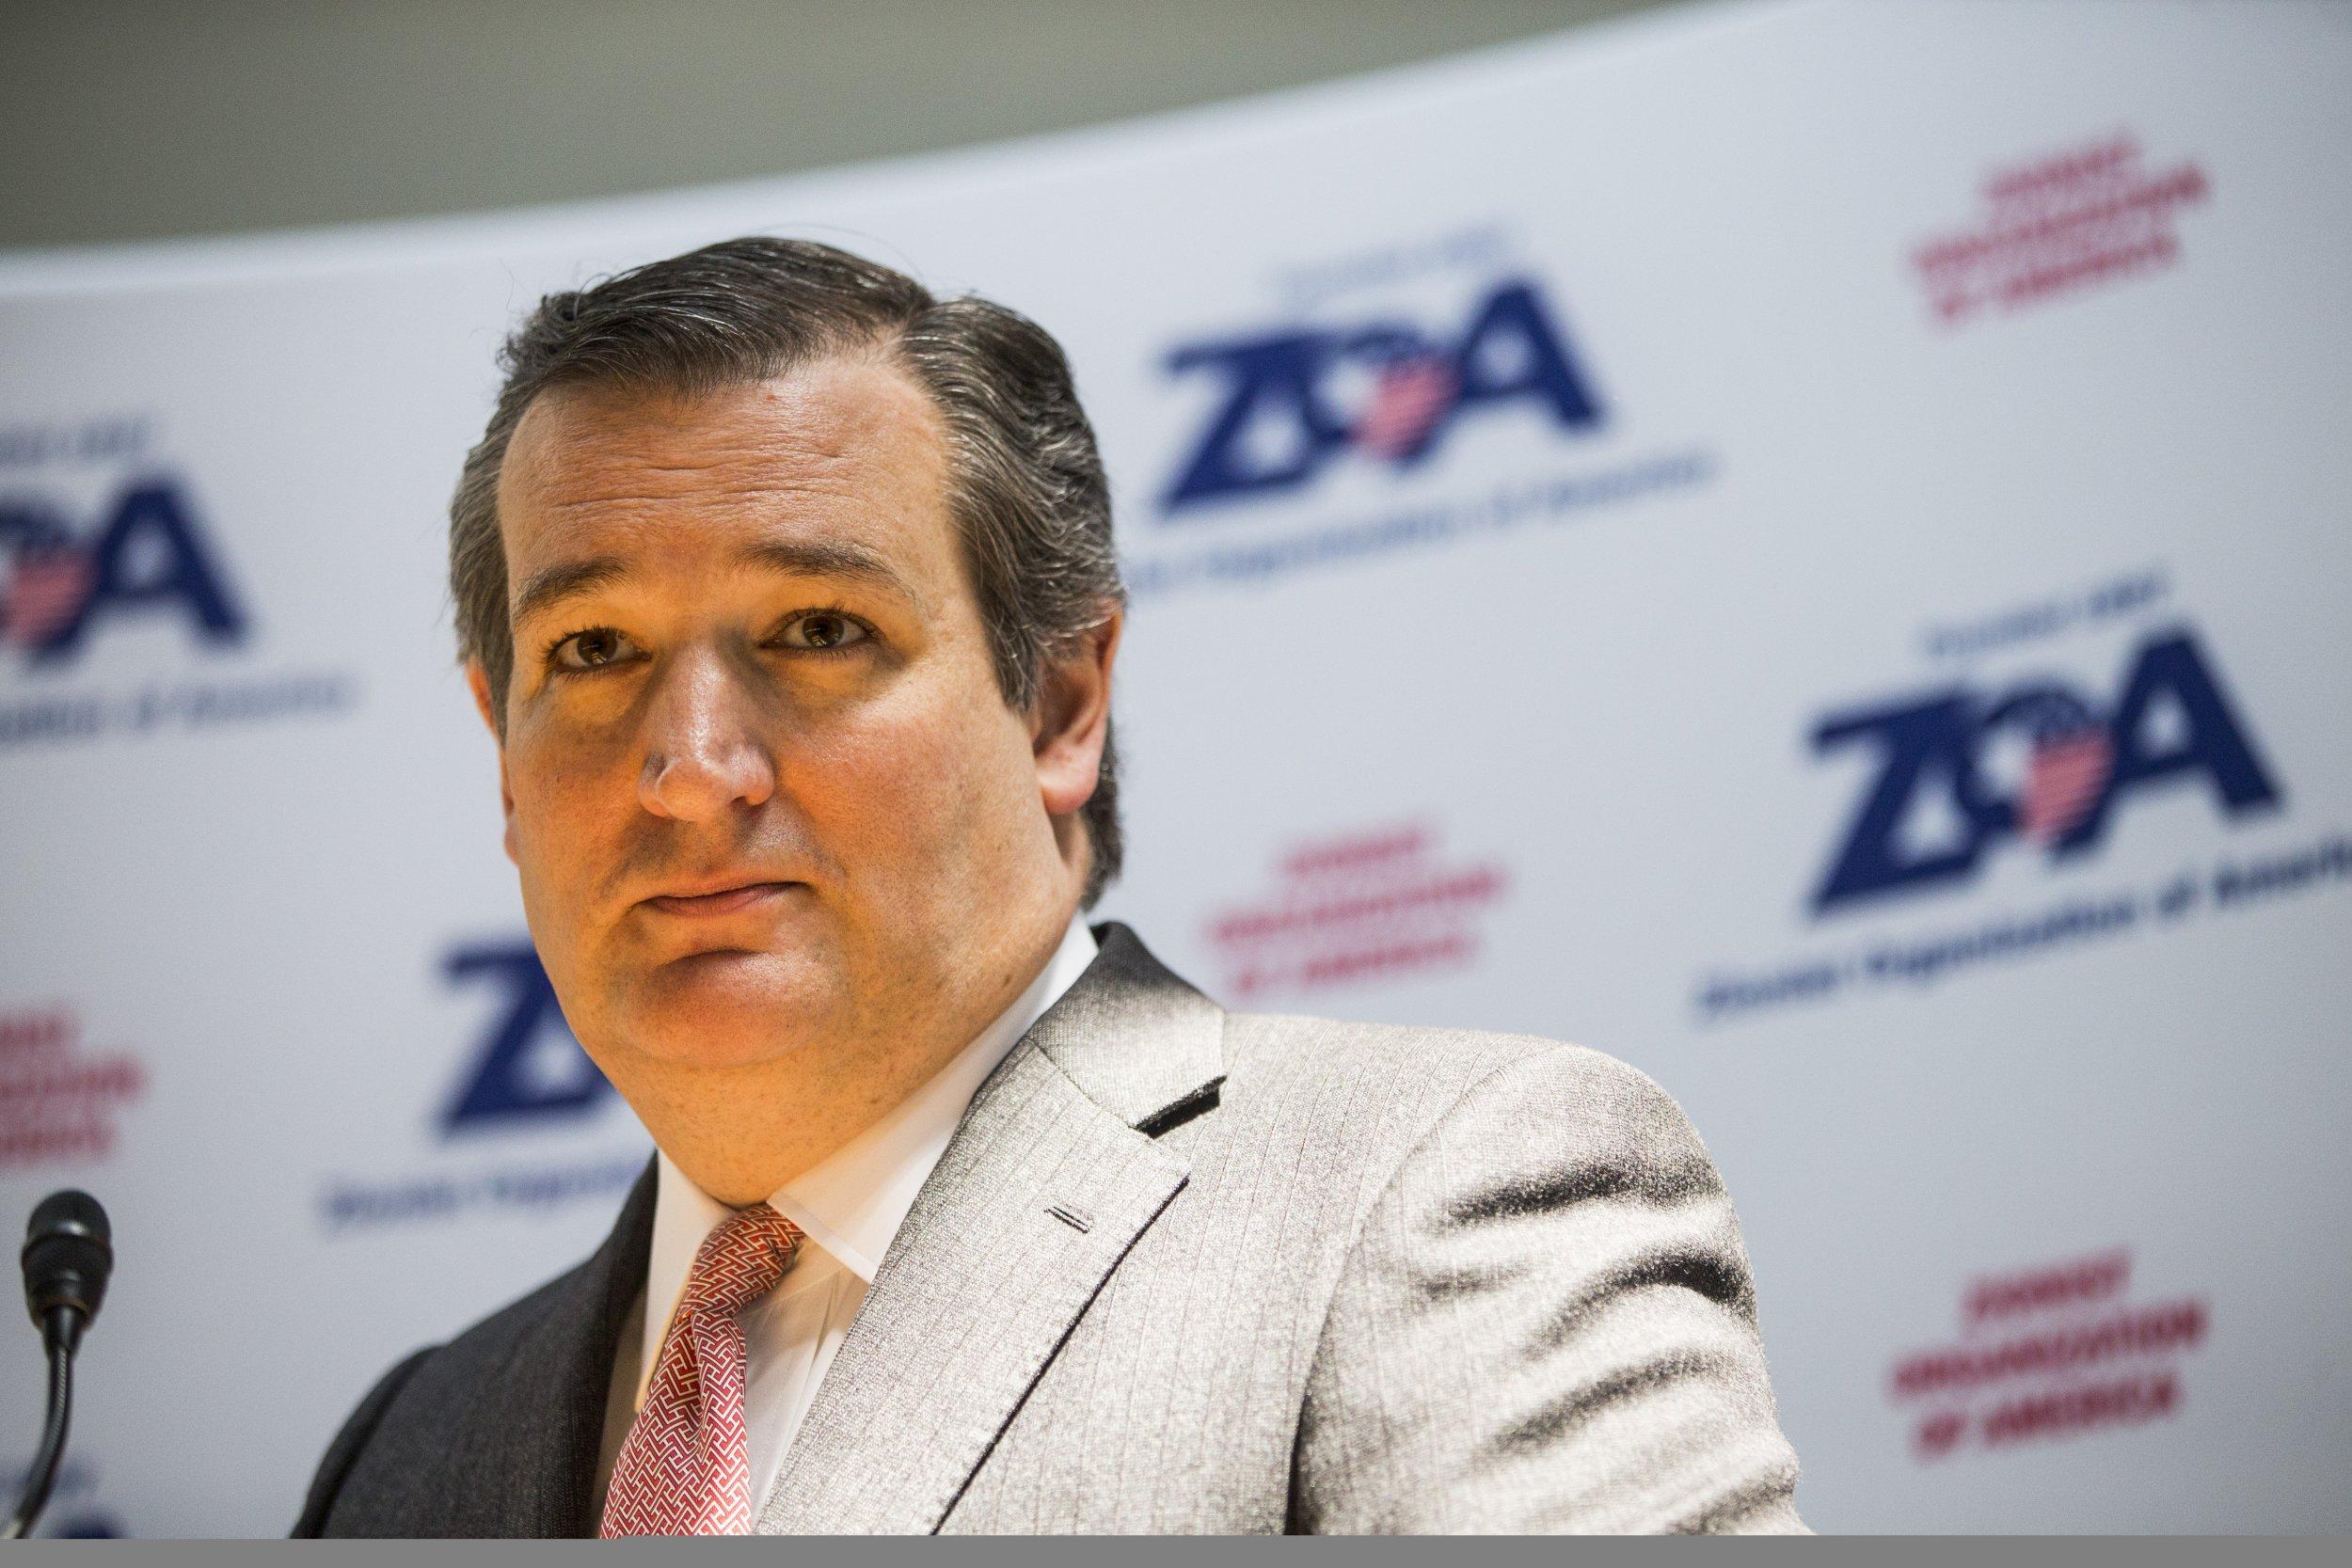 Ted Cruz, Beto O'Rourke, Ireland